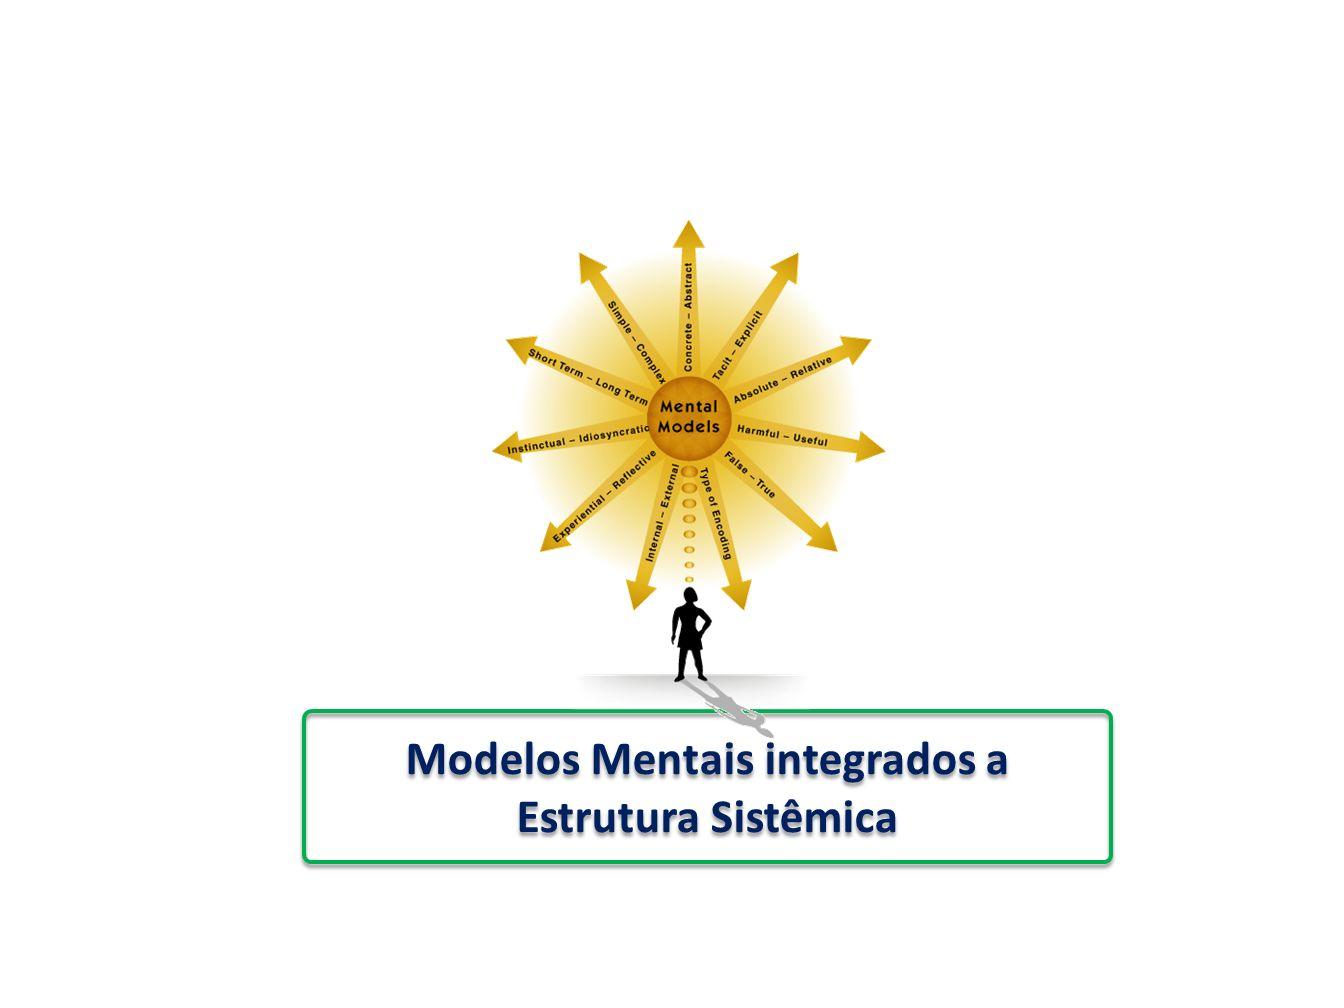 Modelos Mentais integrados a Estrutura Sistêmica